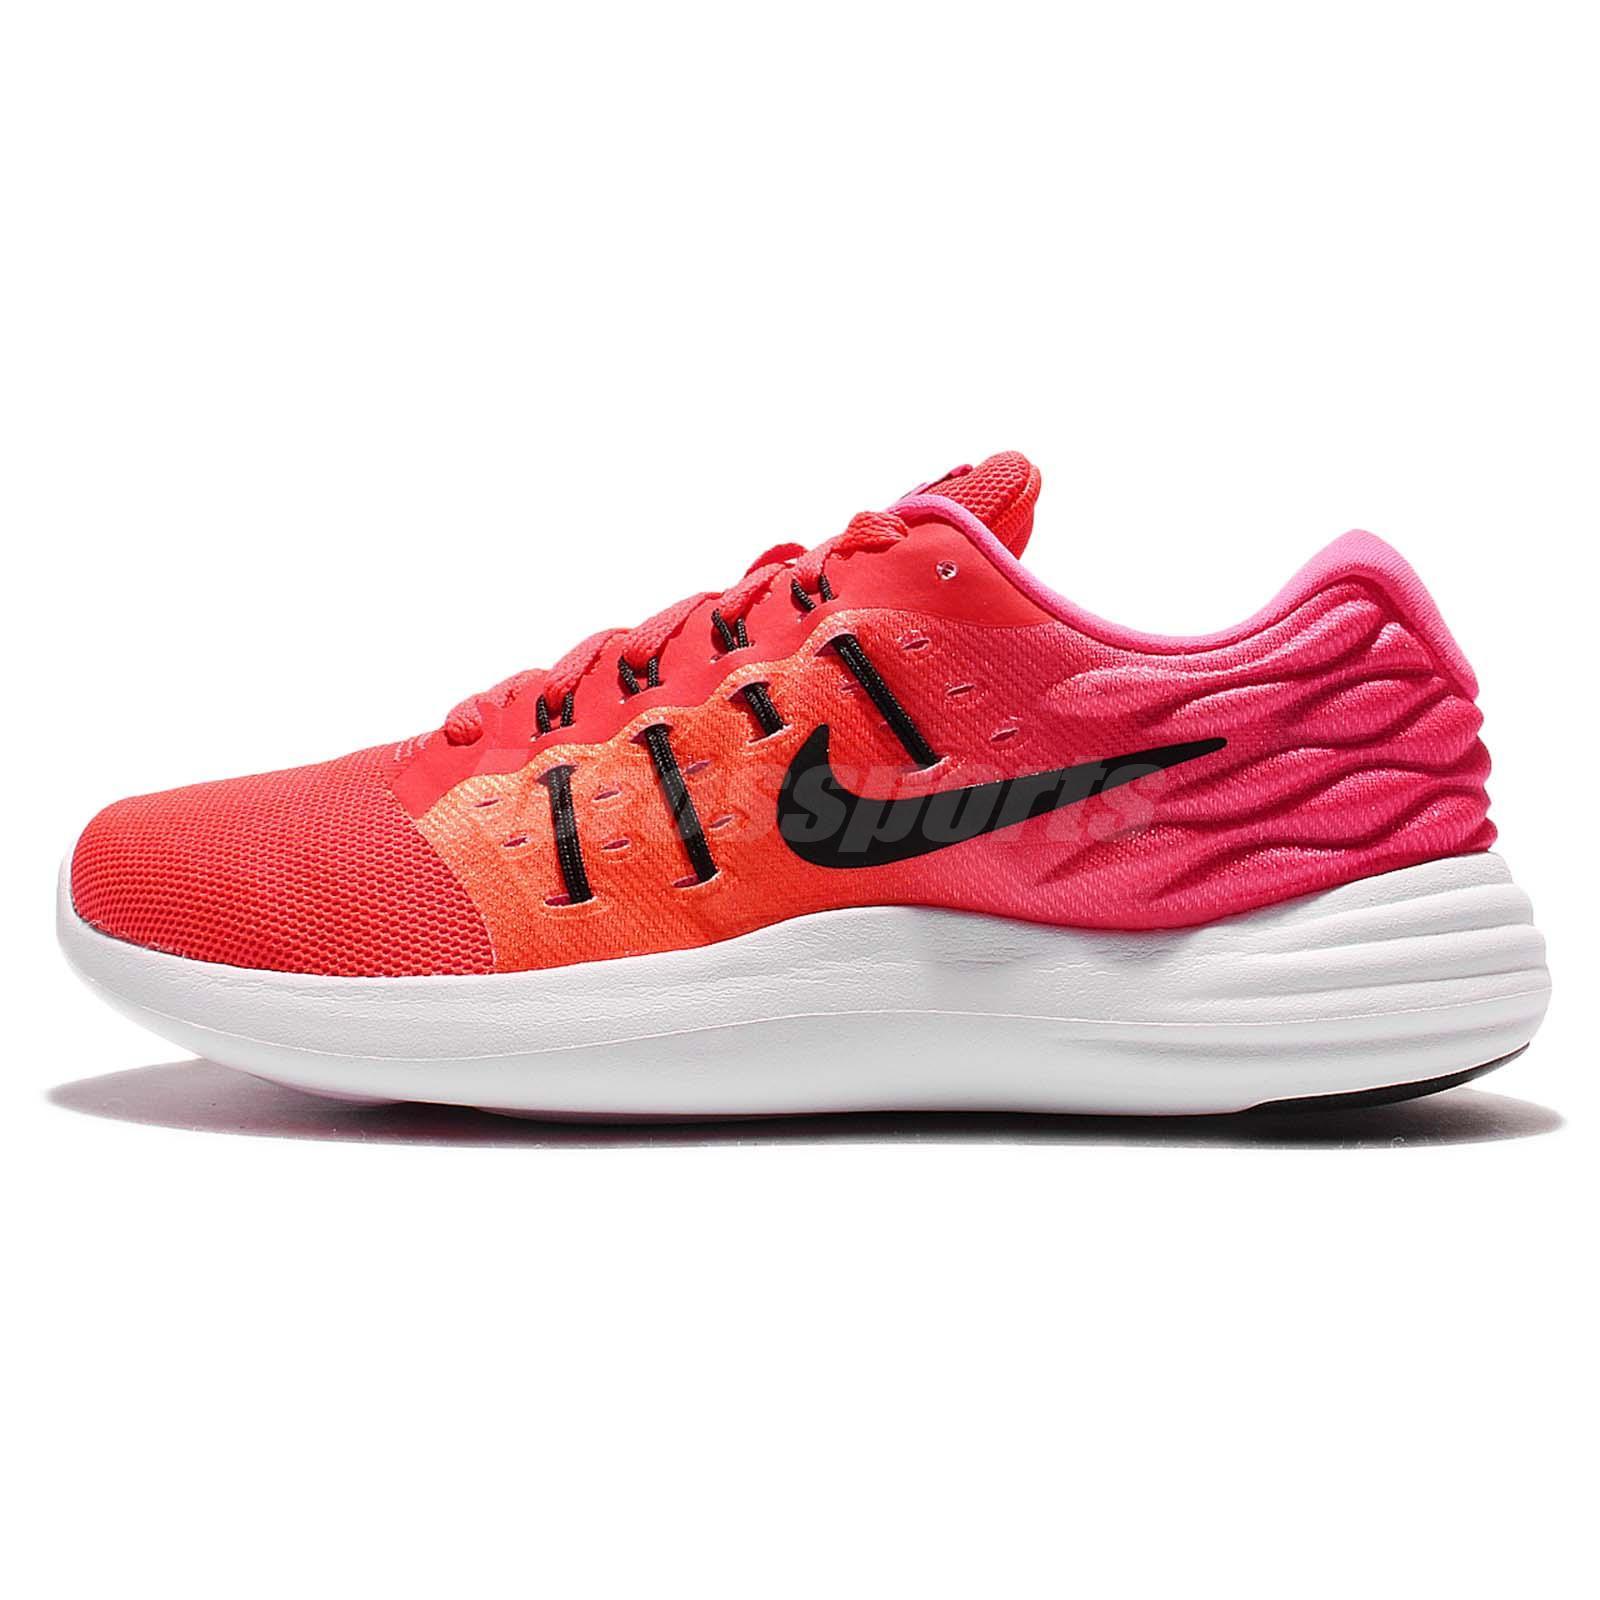 Nike Wmns LunarStelos Red Pink Womens Running Shoes Sneakers 844736-600